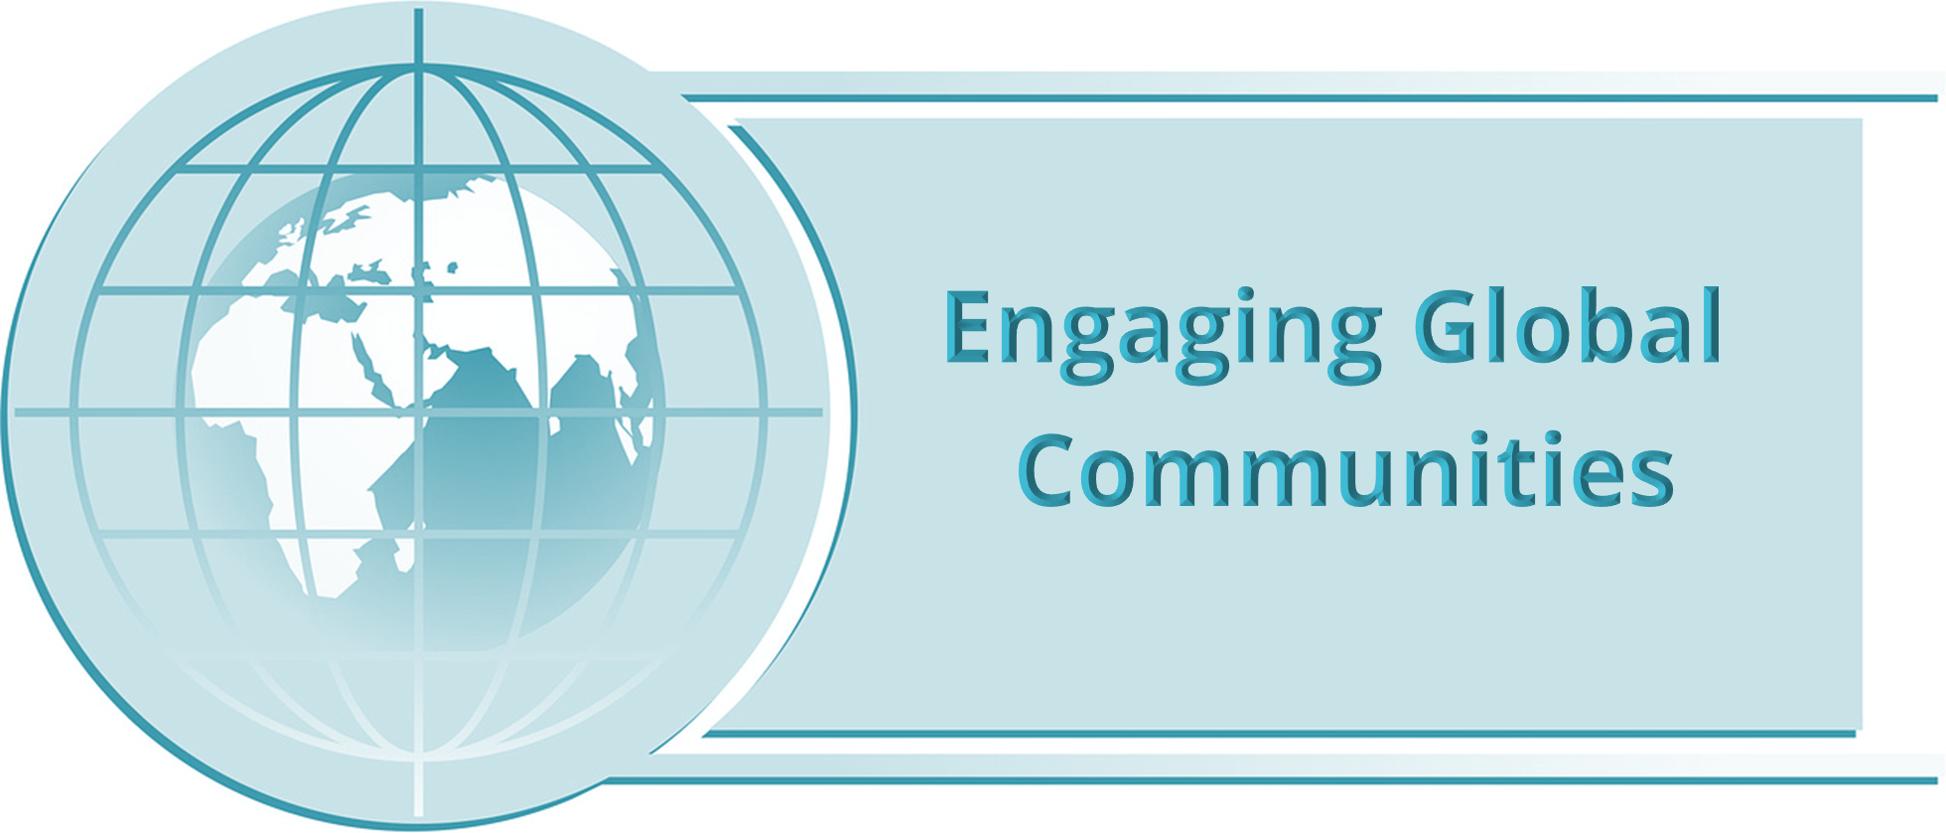 Engaging Global Communities image